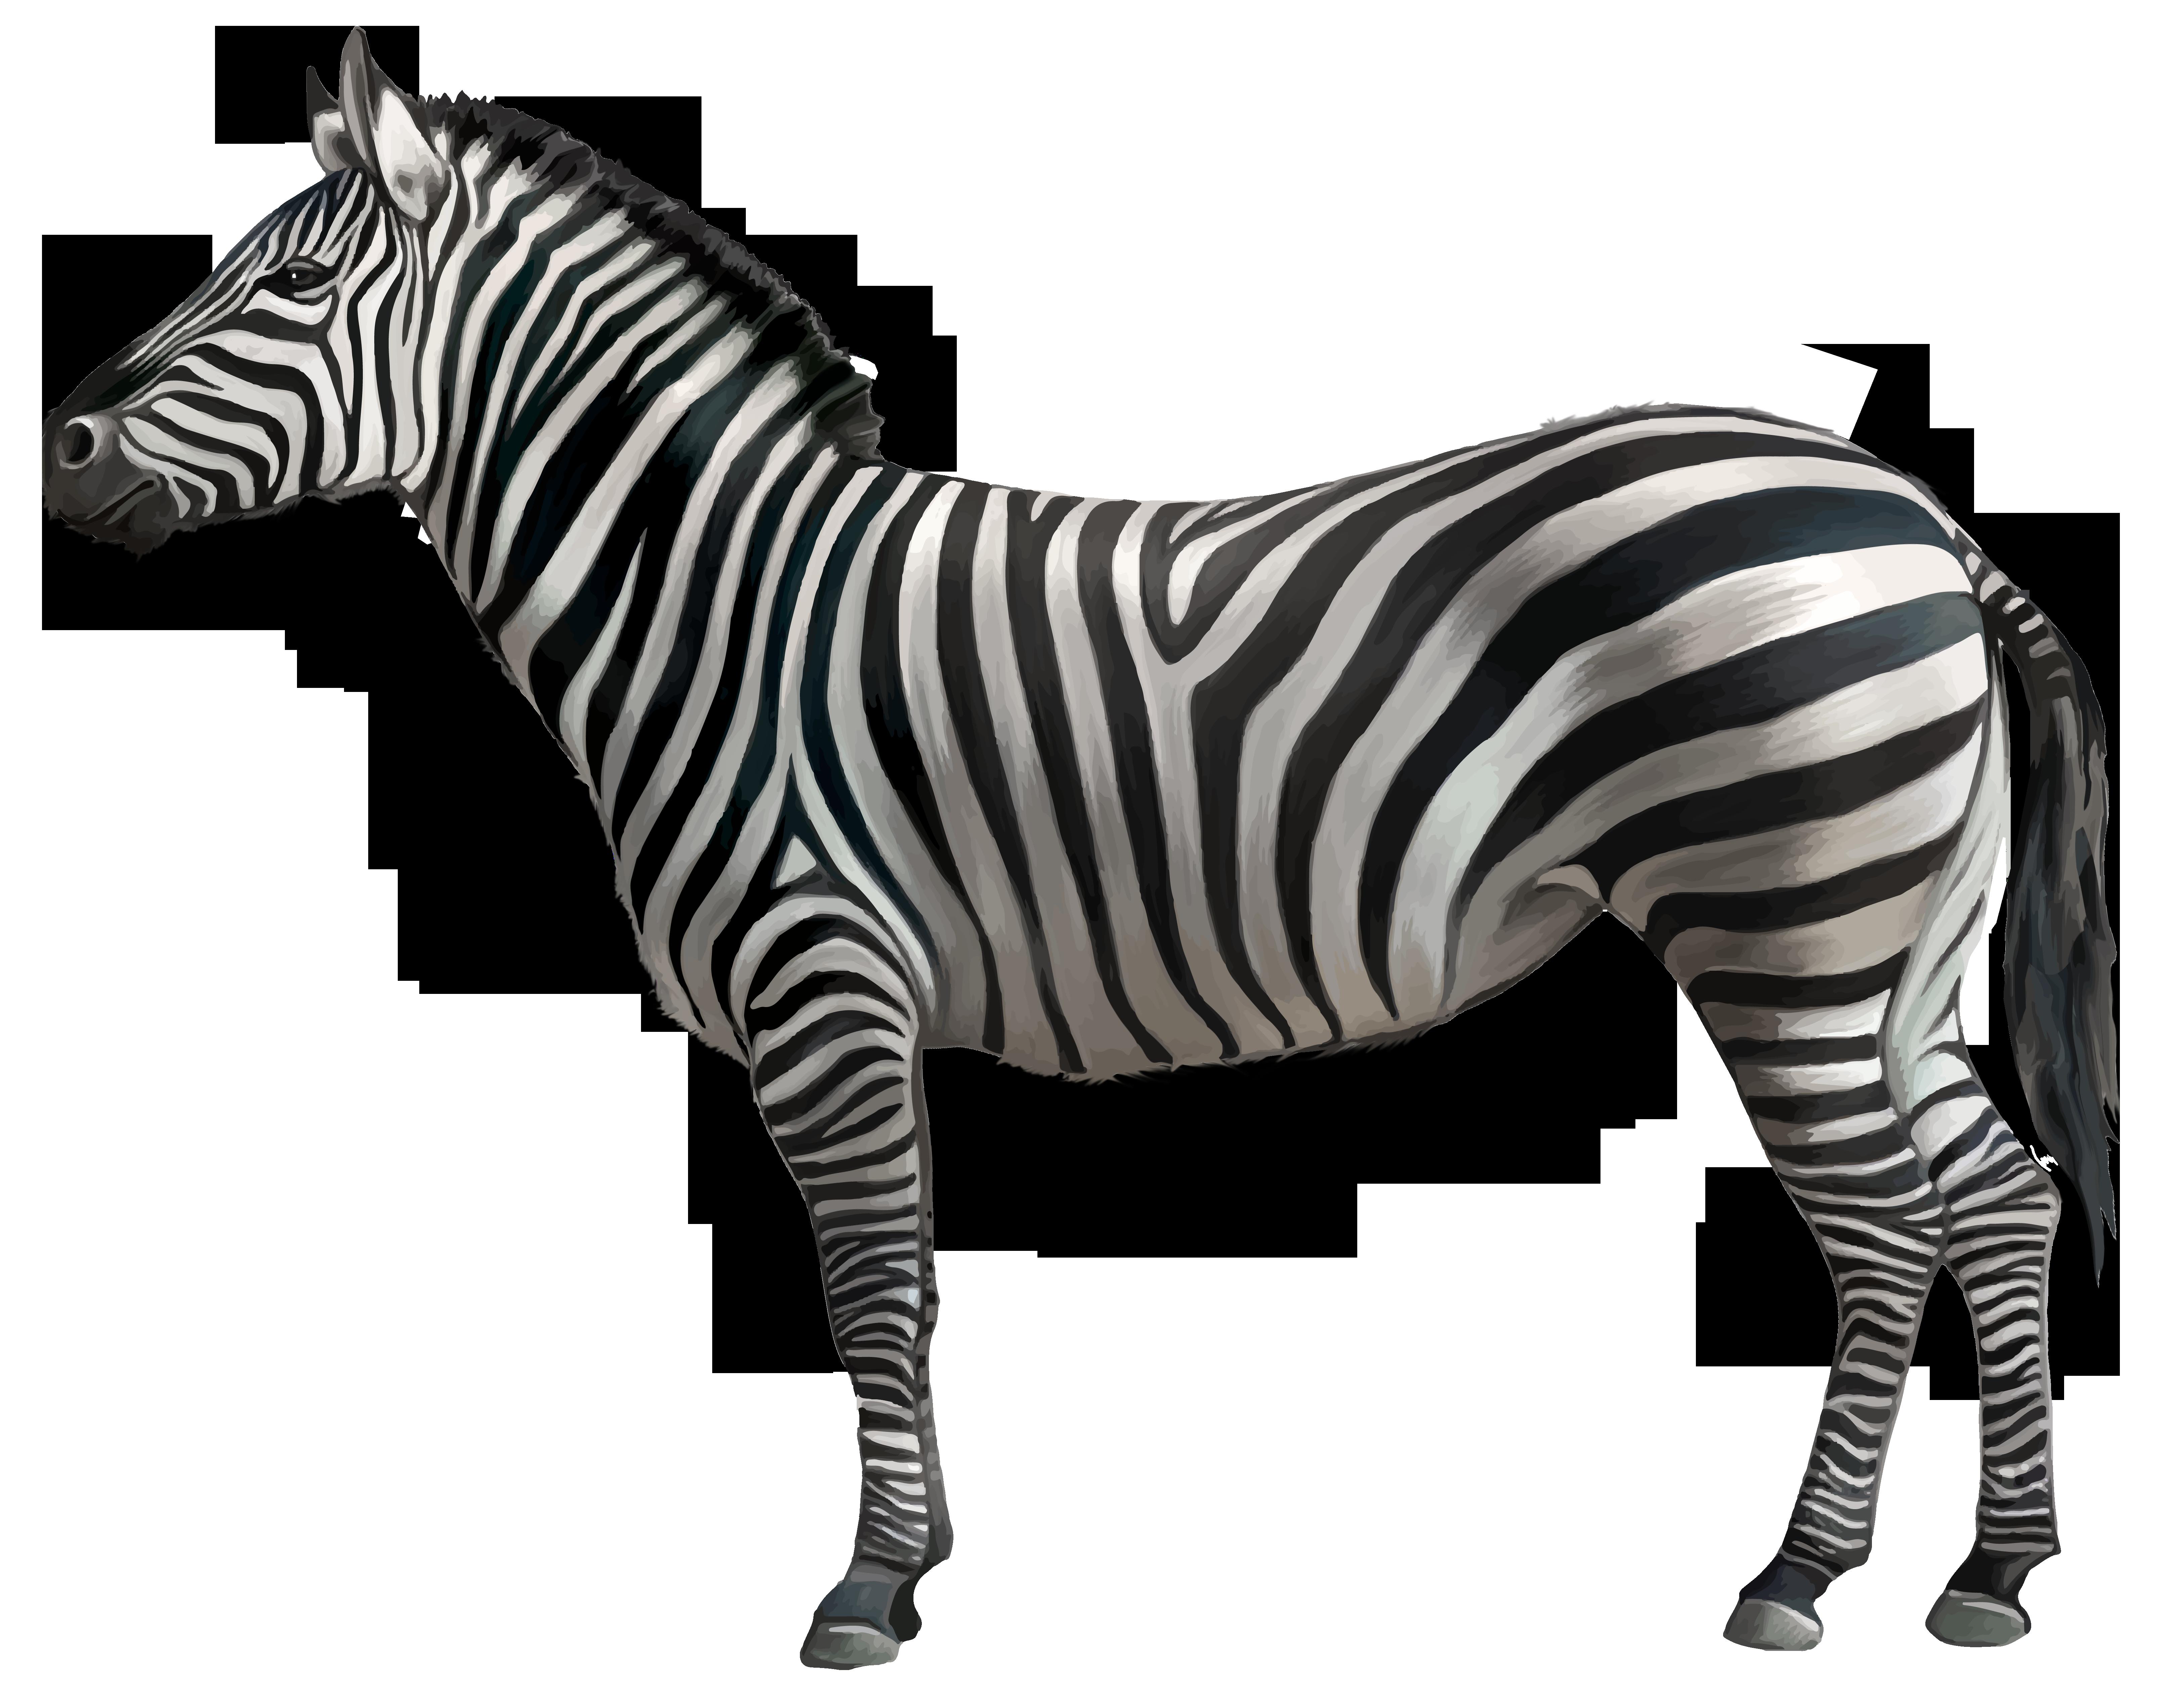 Clipart zebra zebra stripe. Png image gallery yopriceville